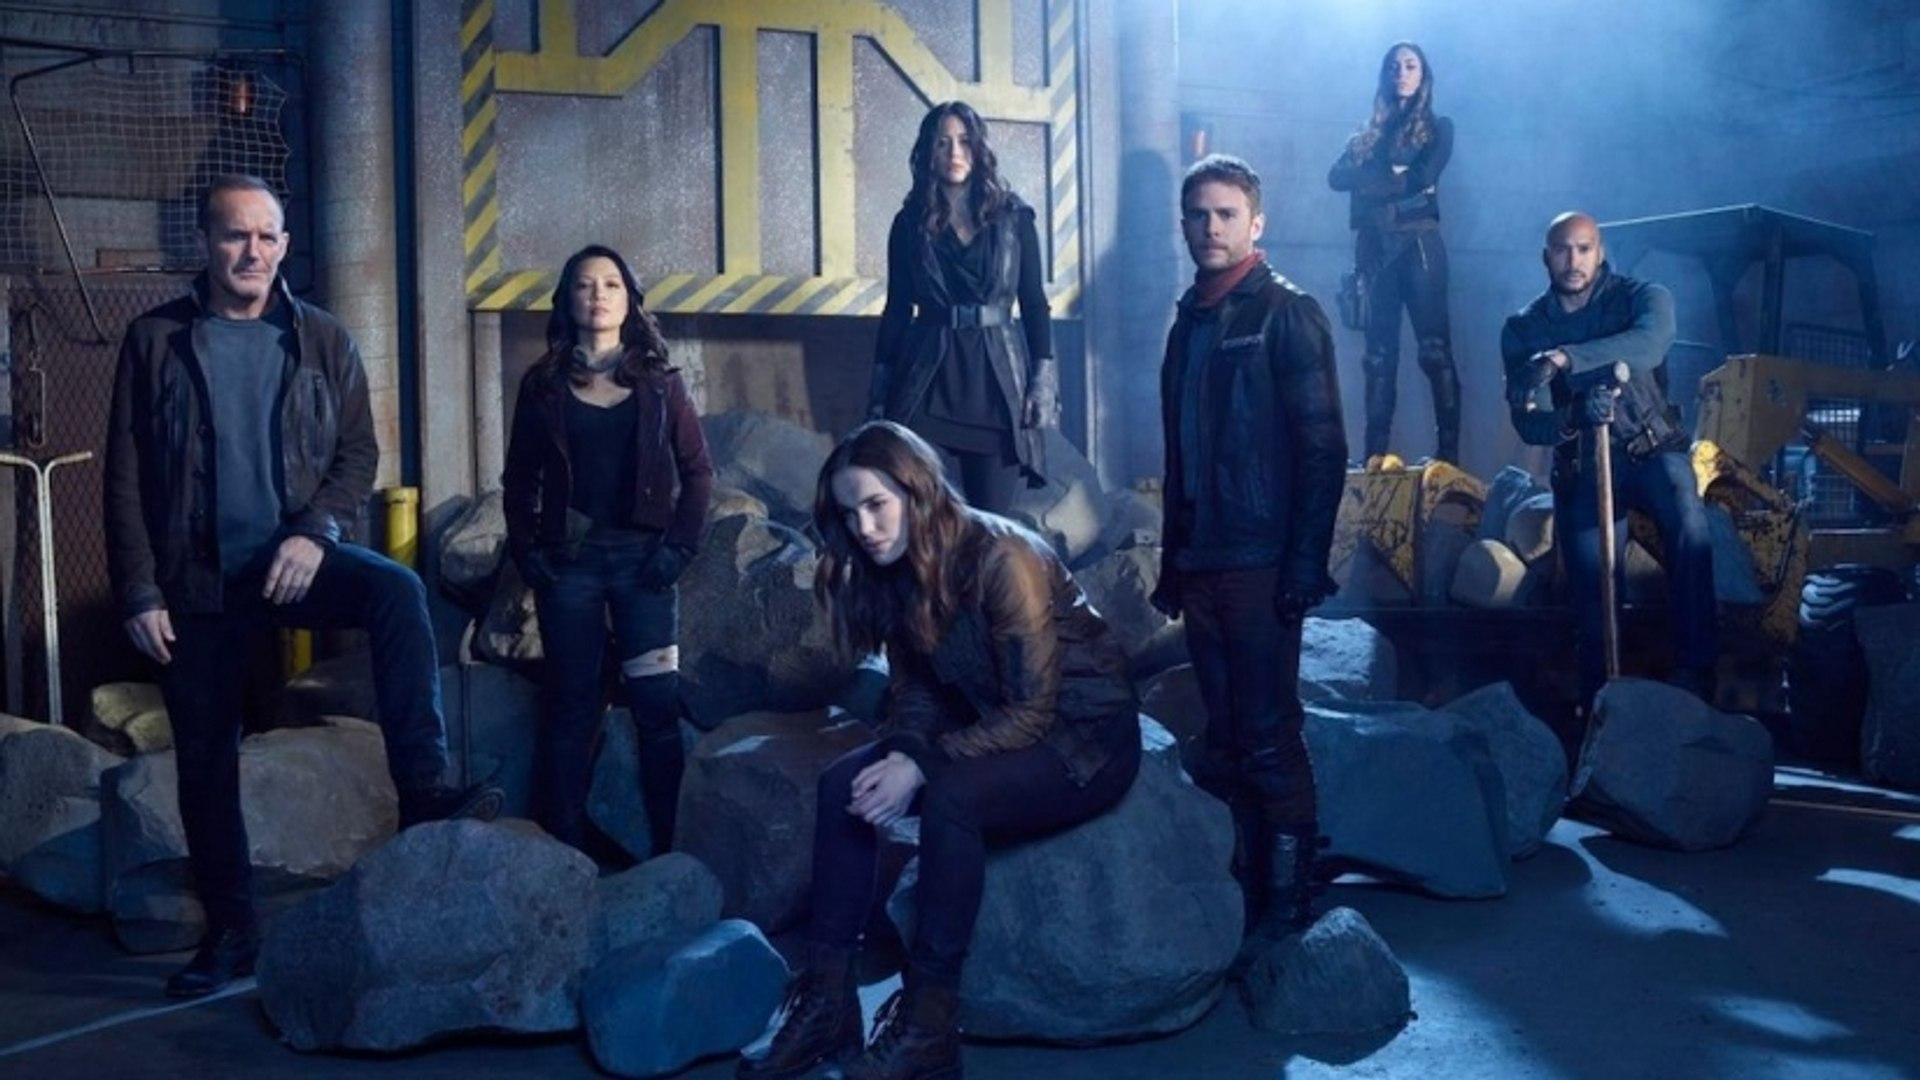 agents of shield season 2 episode 19 online free